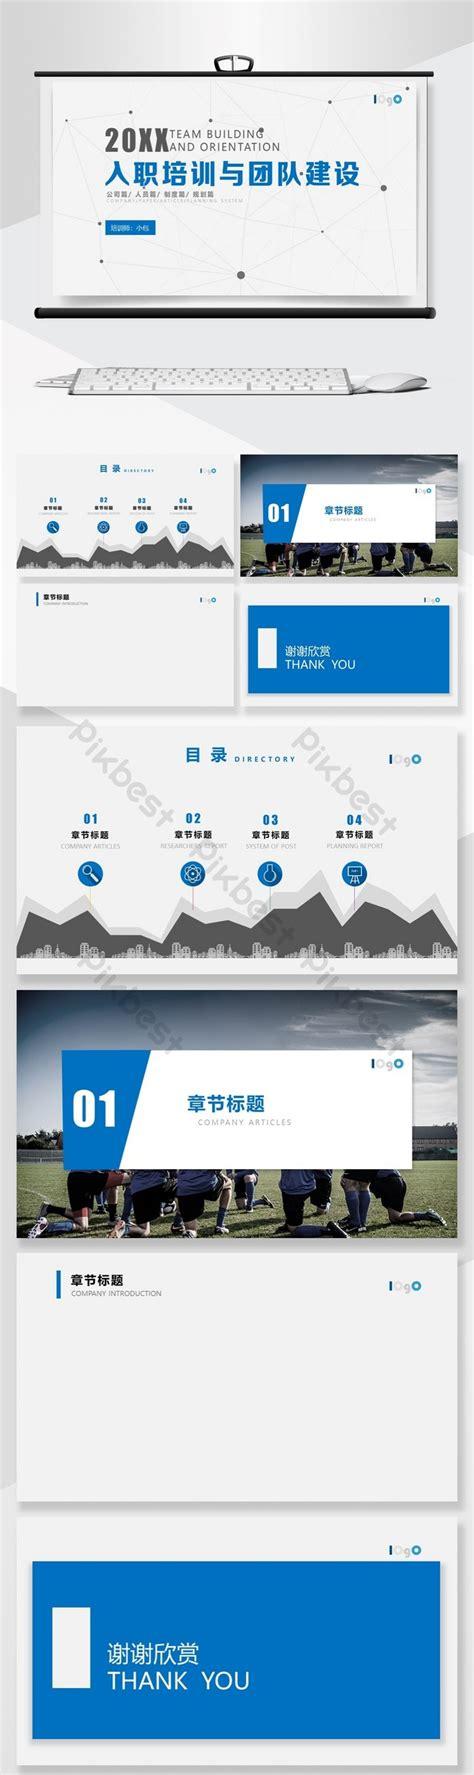 Work with the most accurate pdf to. Biru minimalis latar belakang bangunan tim PPT | PowerPoint templat PPTX Unduhan gratis - Pikbest